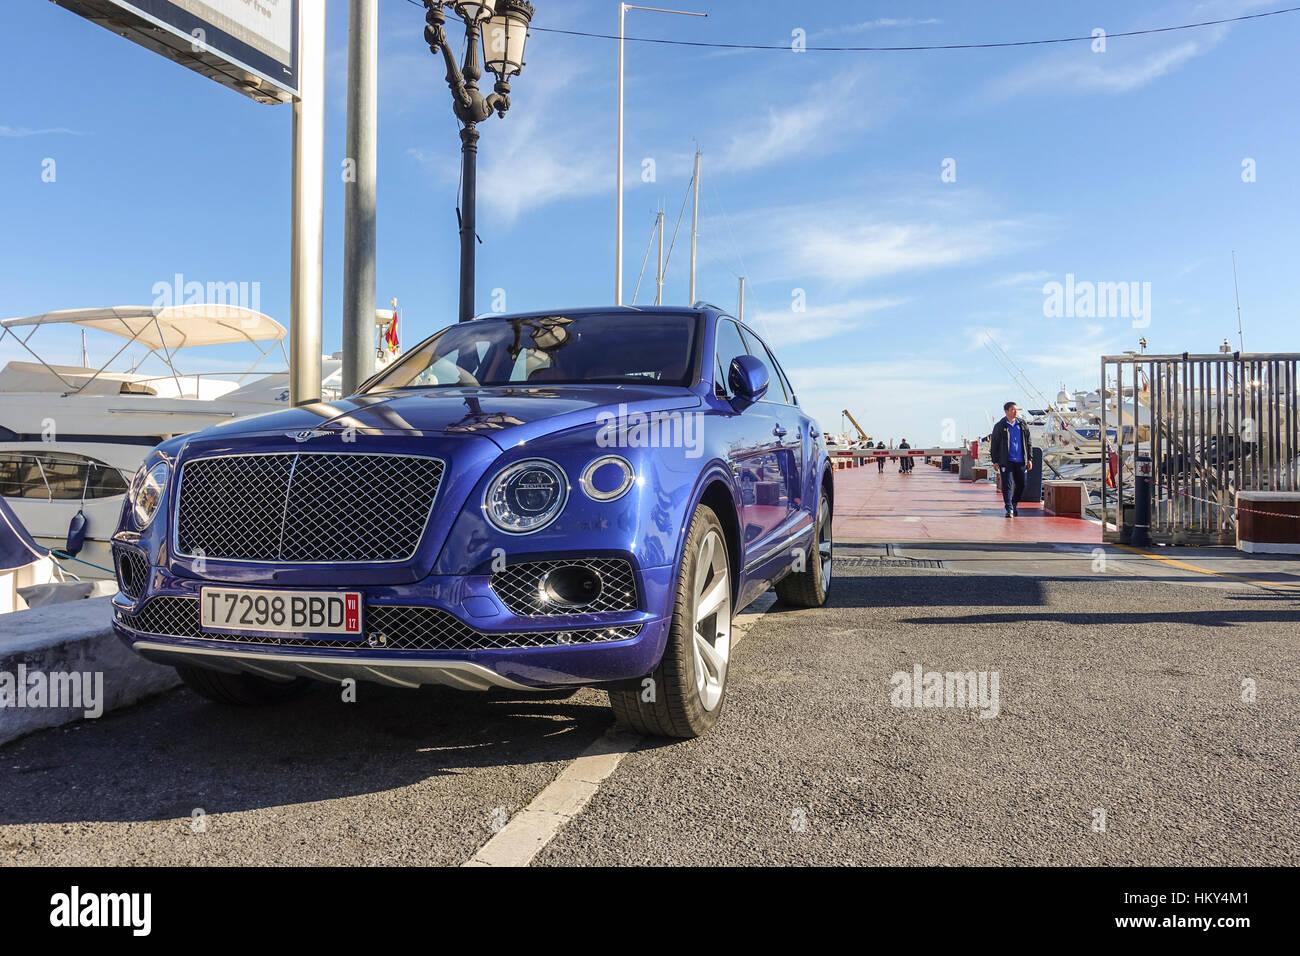 Bentley Bentayga SUV geparkt im Luxus Yachthafen Puerto Banus, Marbella, Spanien Stockbild